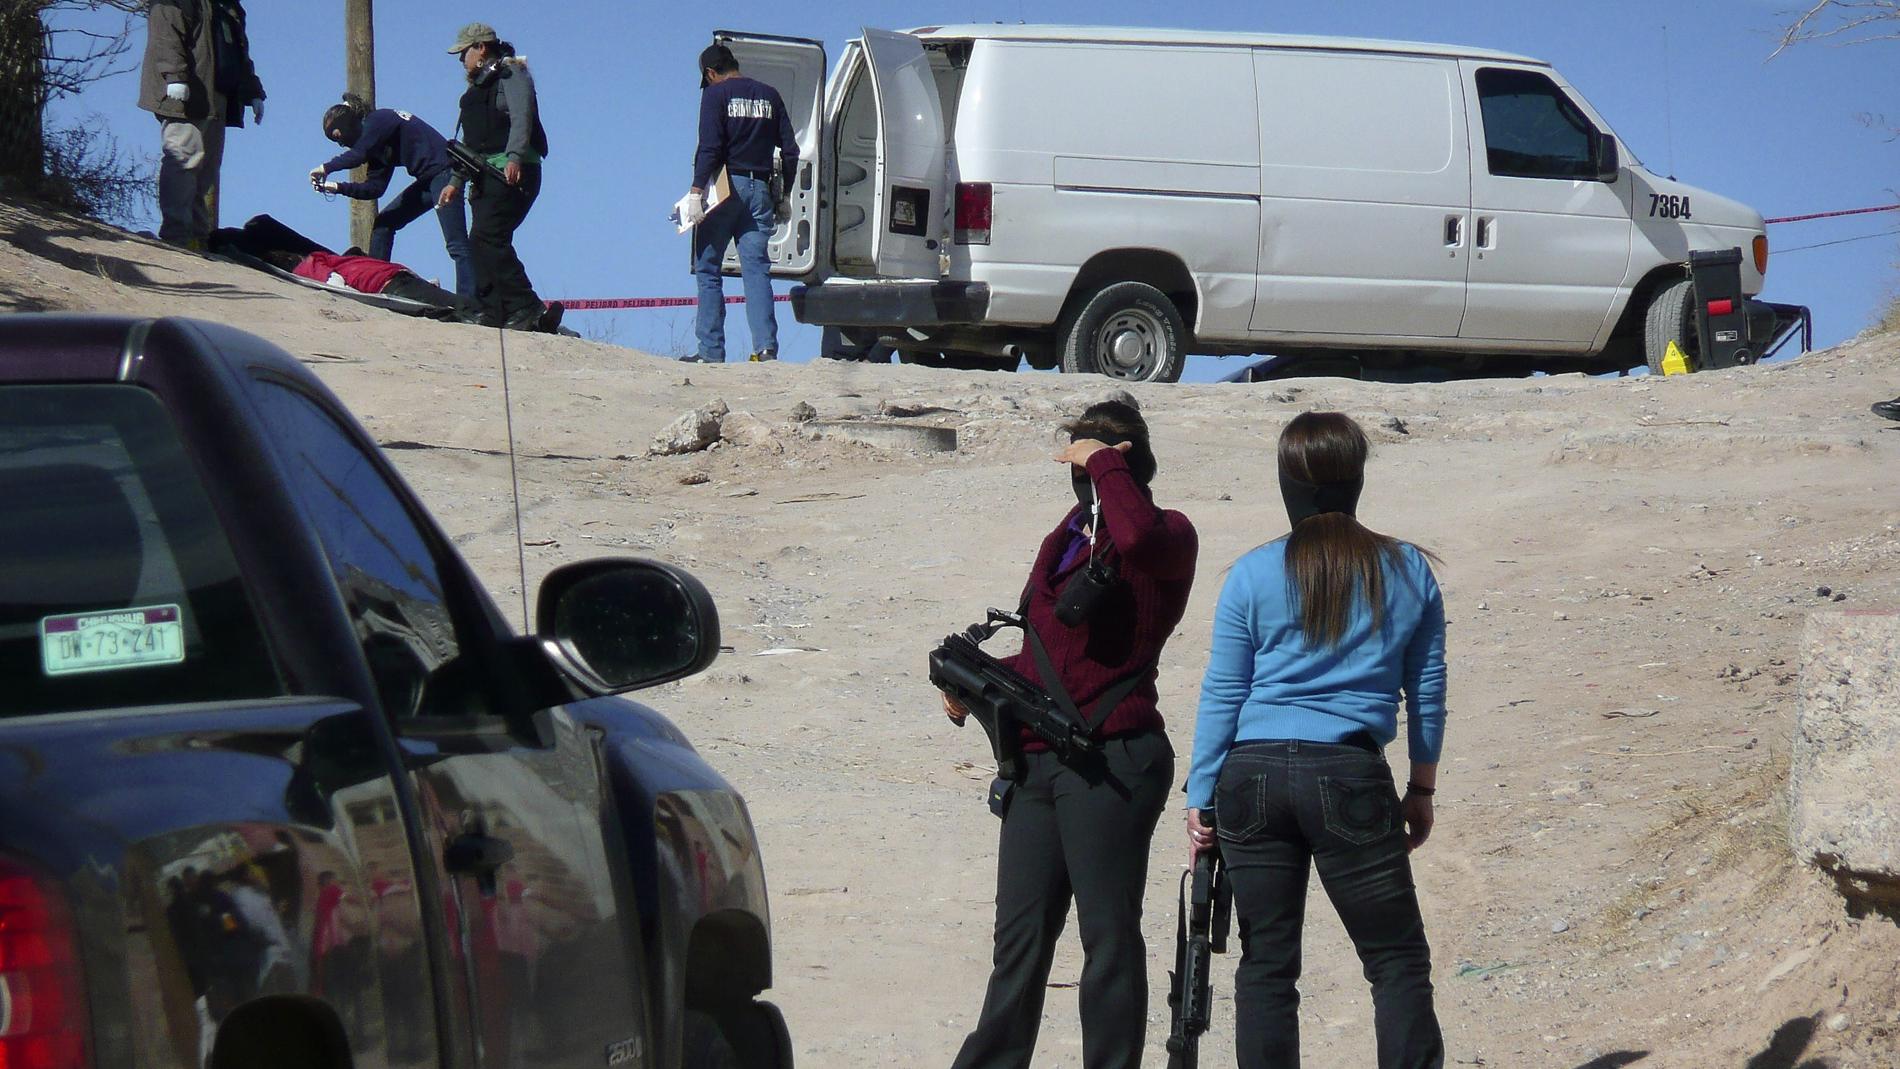 México registra en cuatro días mas asesinatos que en todo un año en España